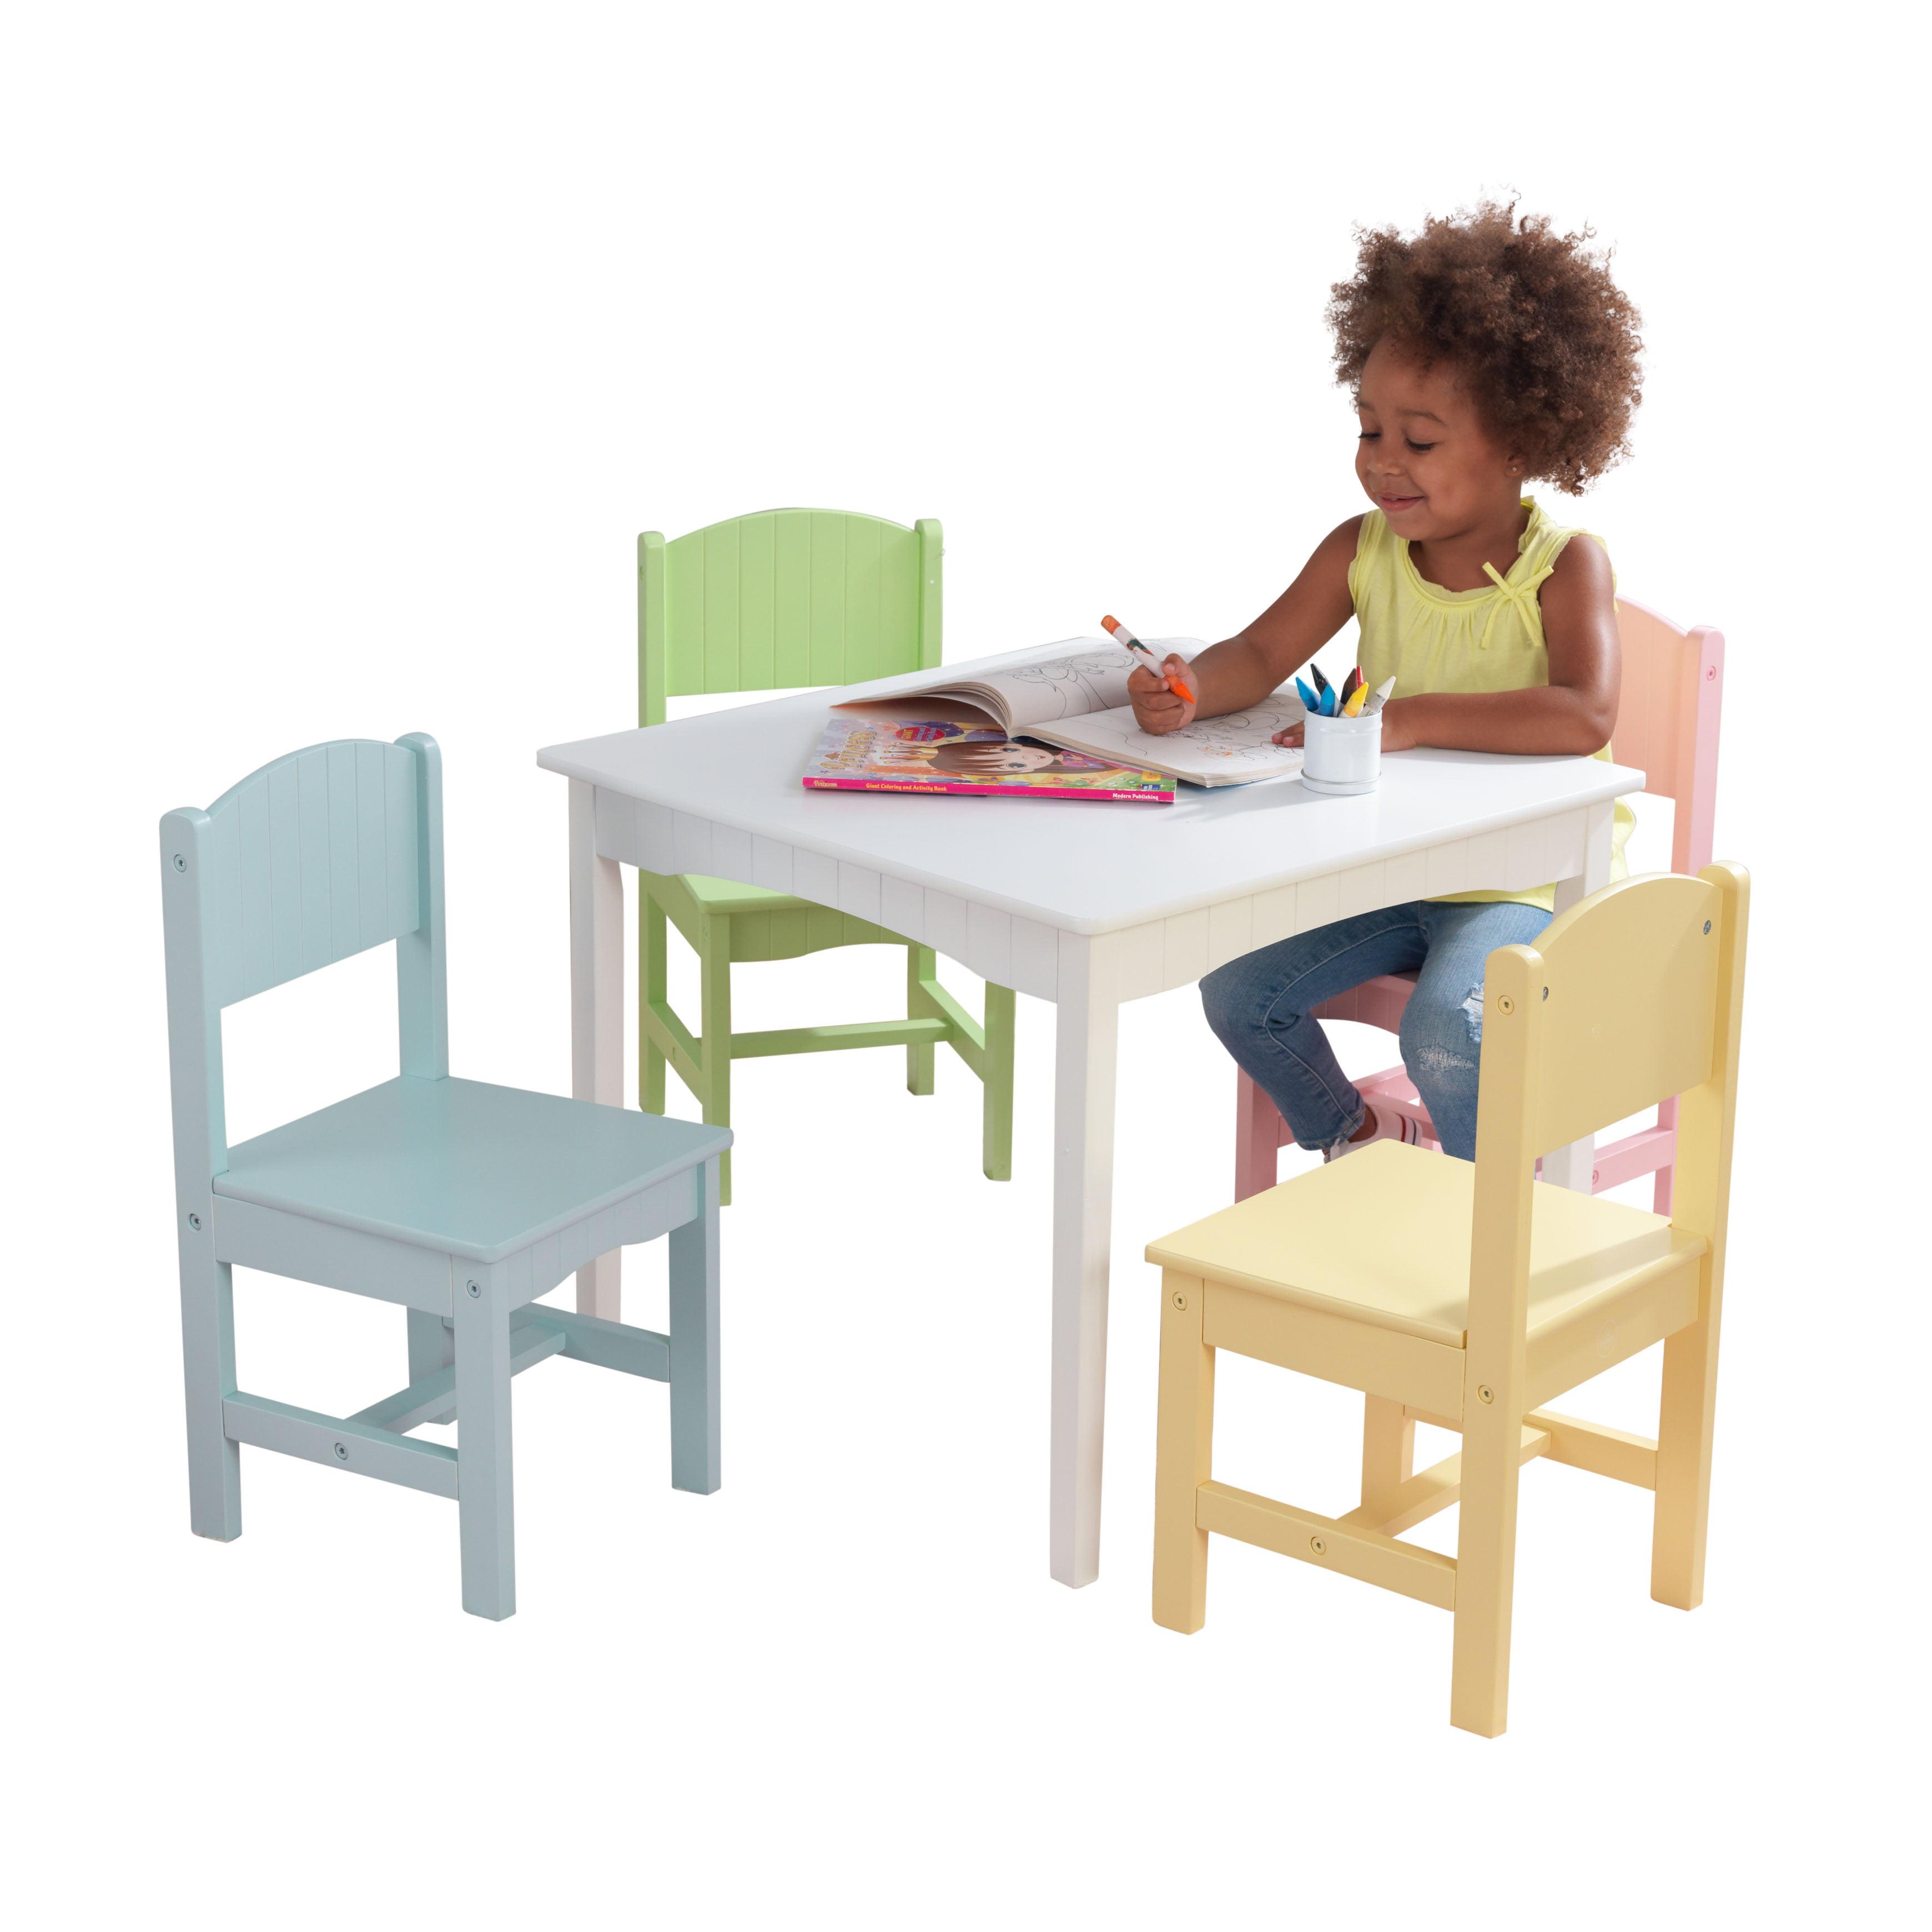 Kidkraft nantucket table 4 chair set multiple colors walmart com